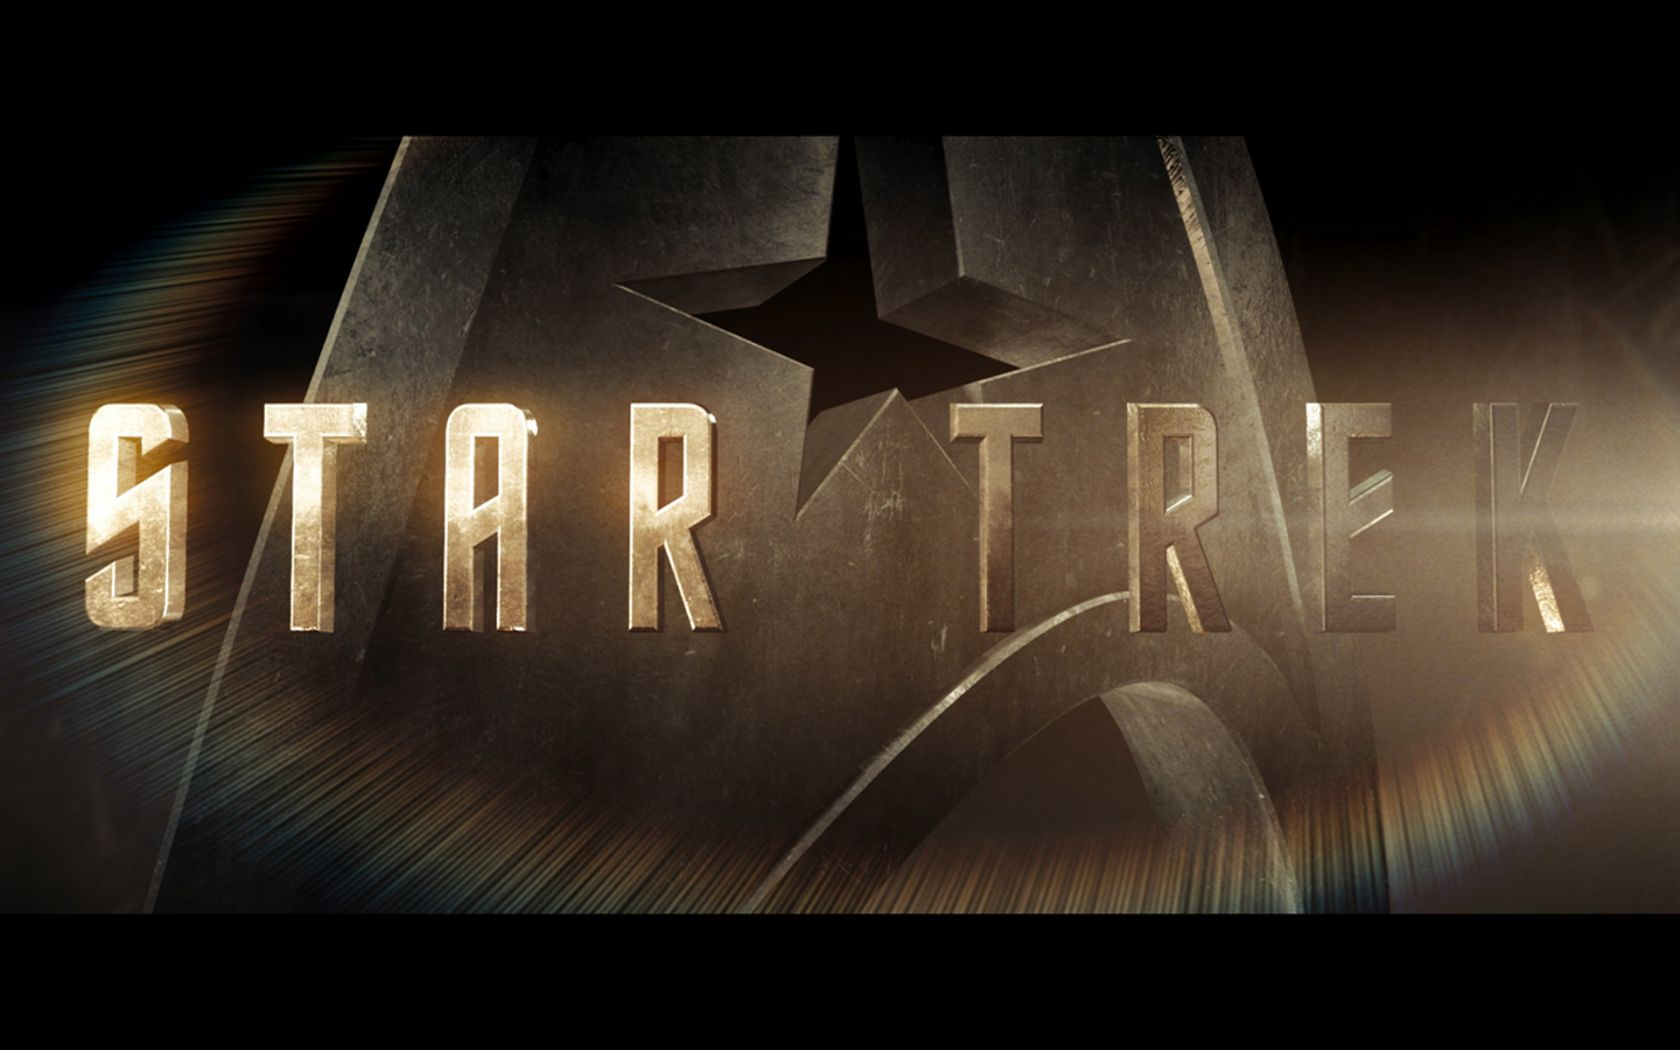 Star Trek 2009 Title Logo Wallpaper 1680x1050